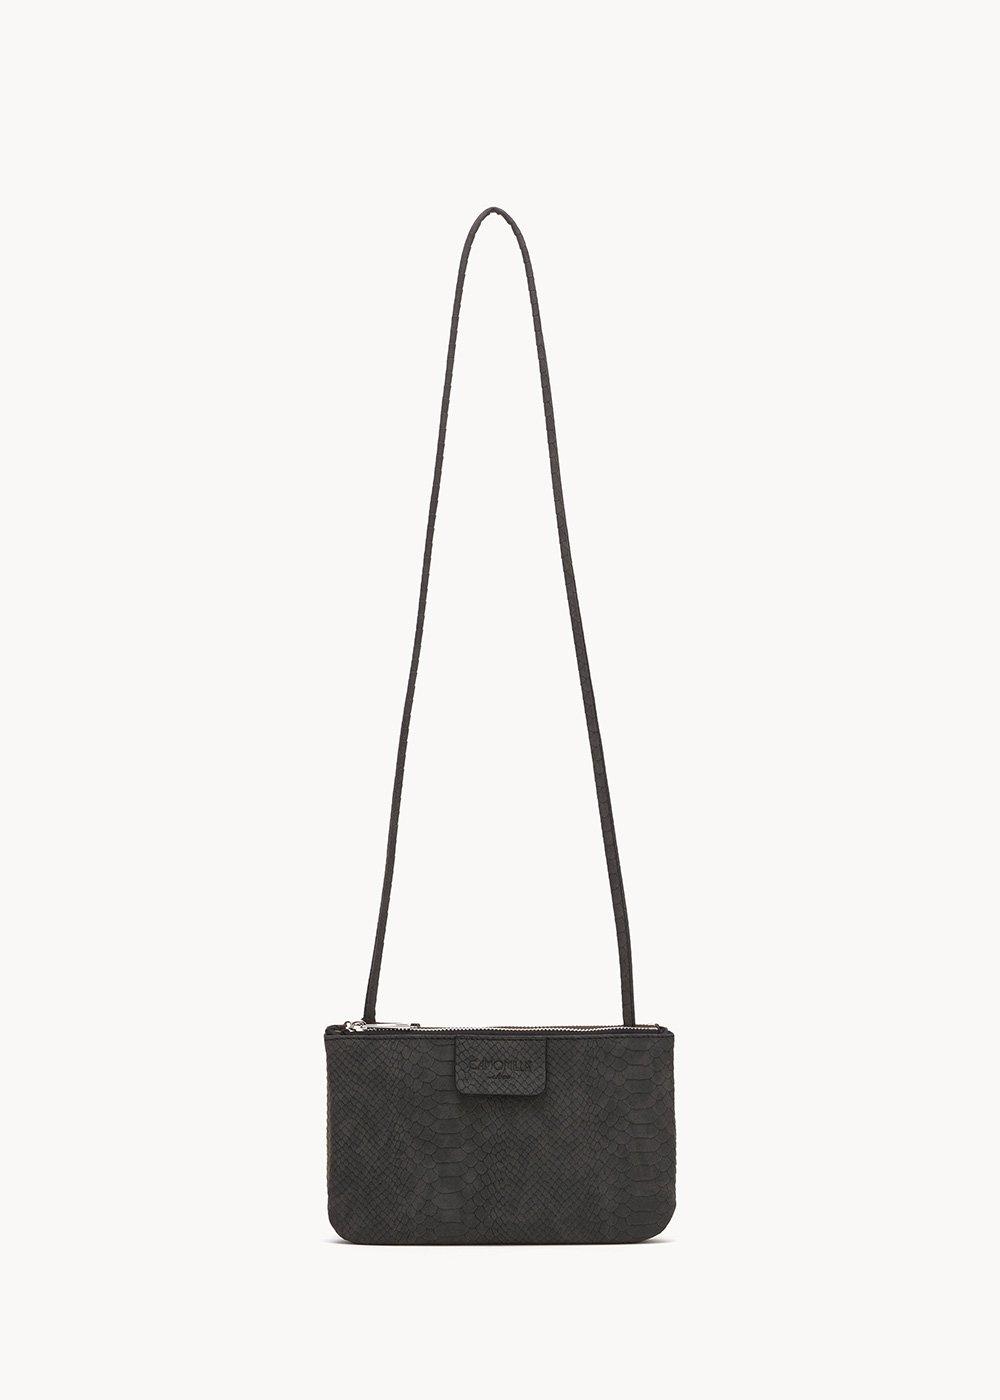 Tonga two-tone clutch bag - Black / Grape - Woman